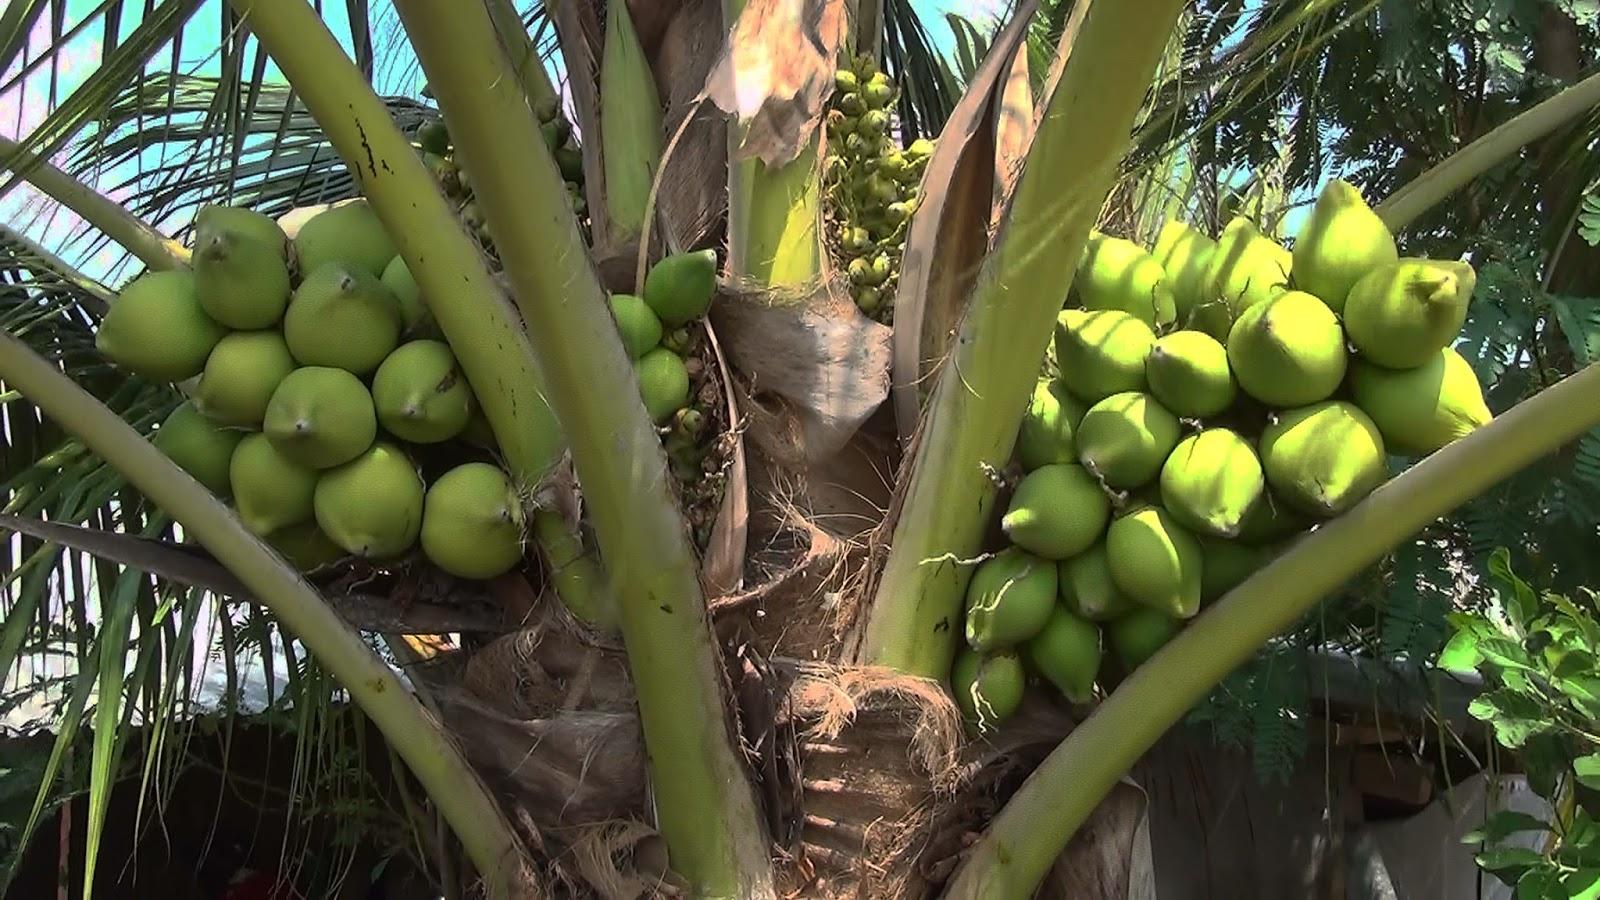 Quán Ăn Dừa Sáp tpHCM